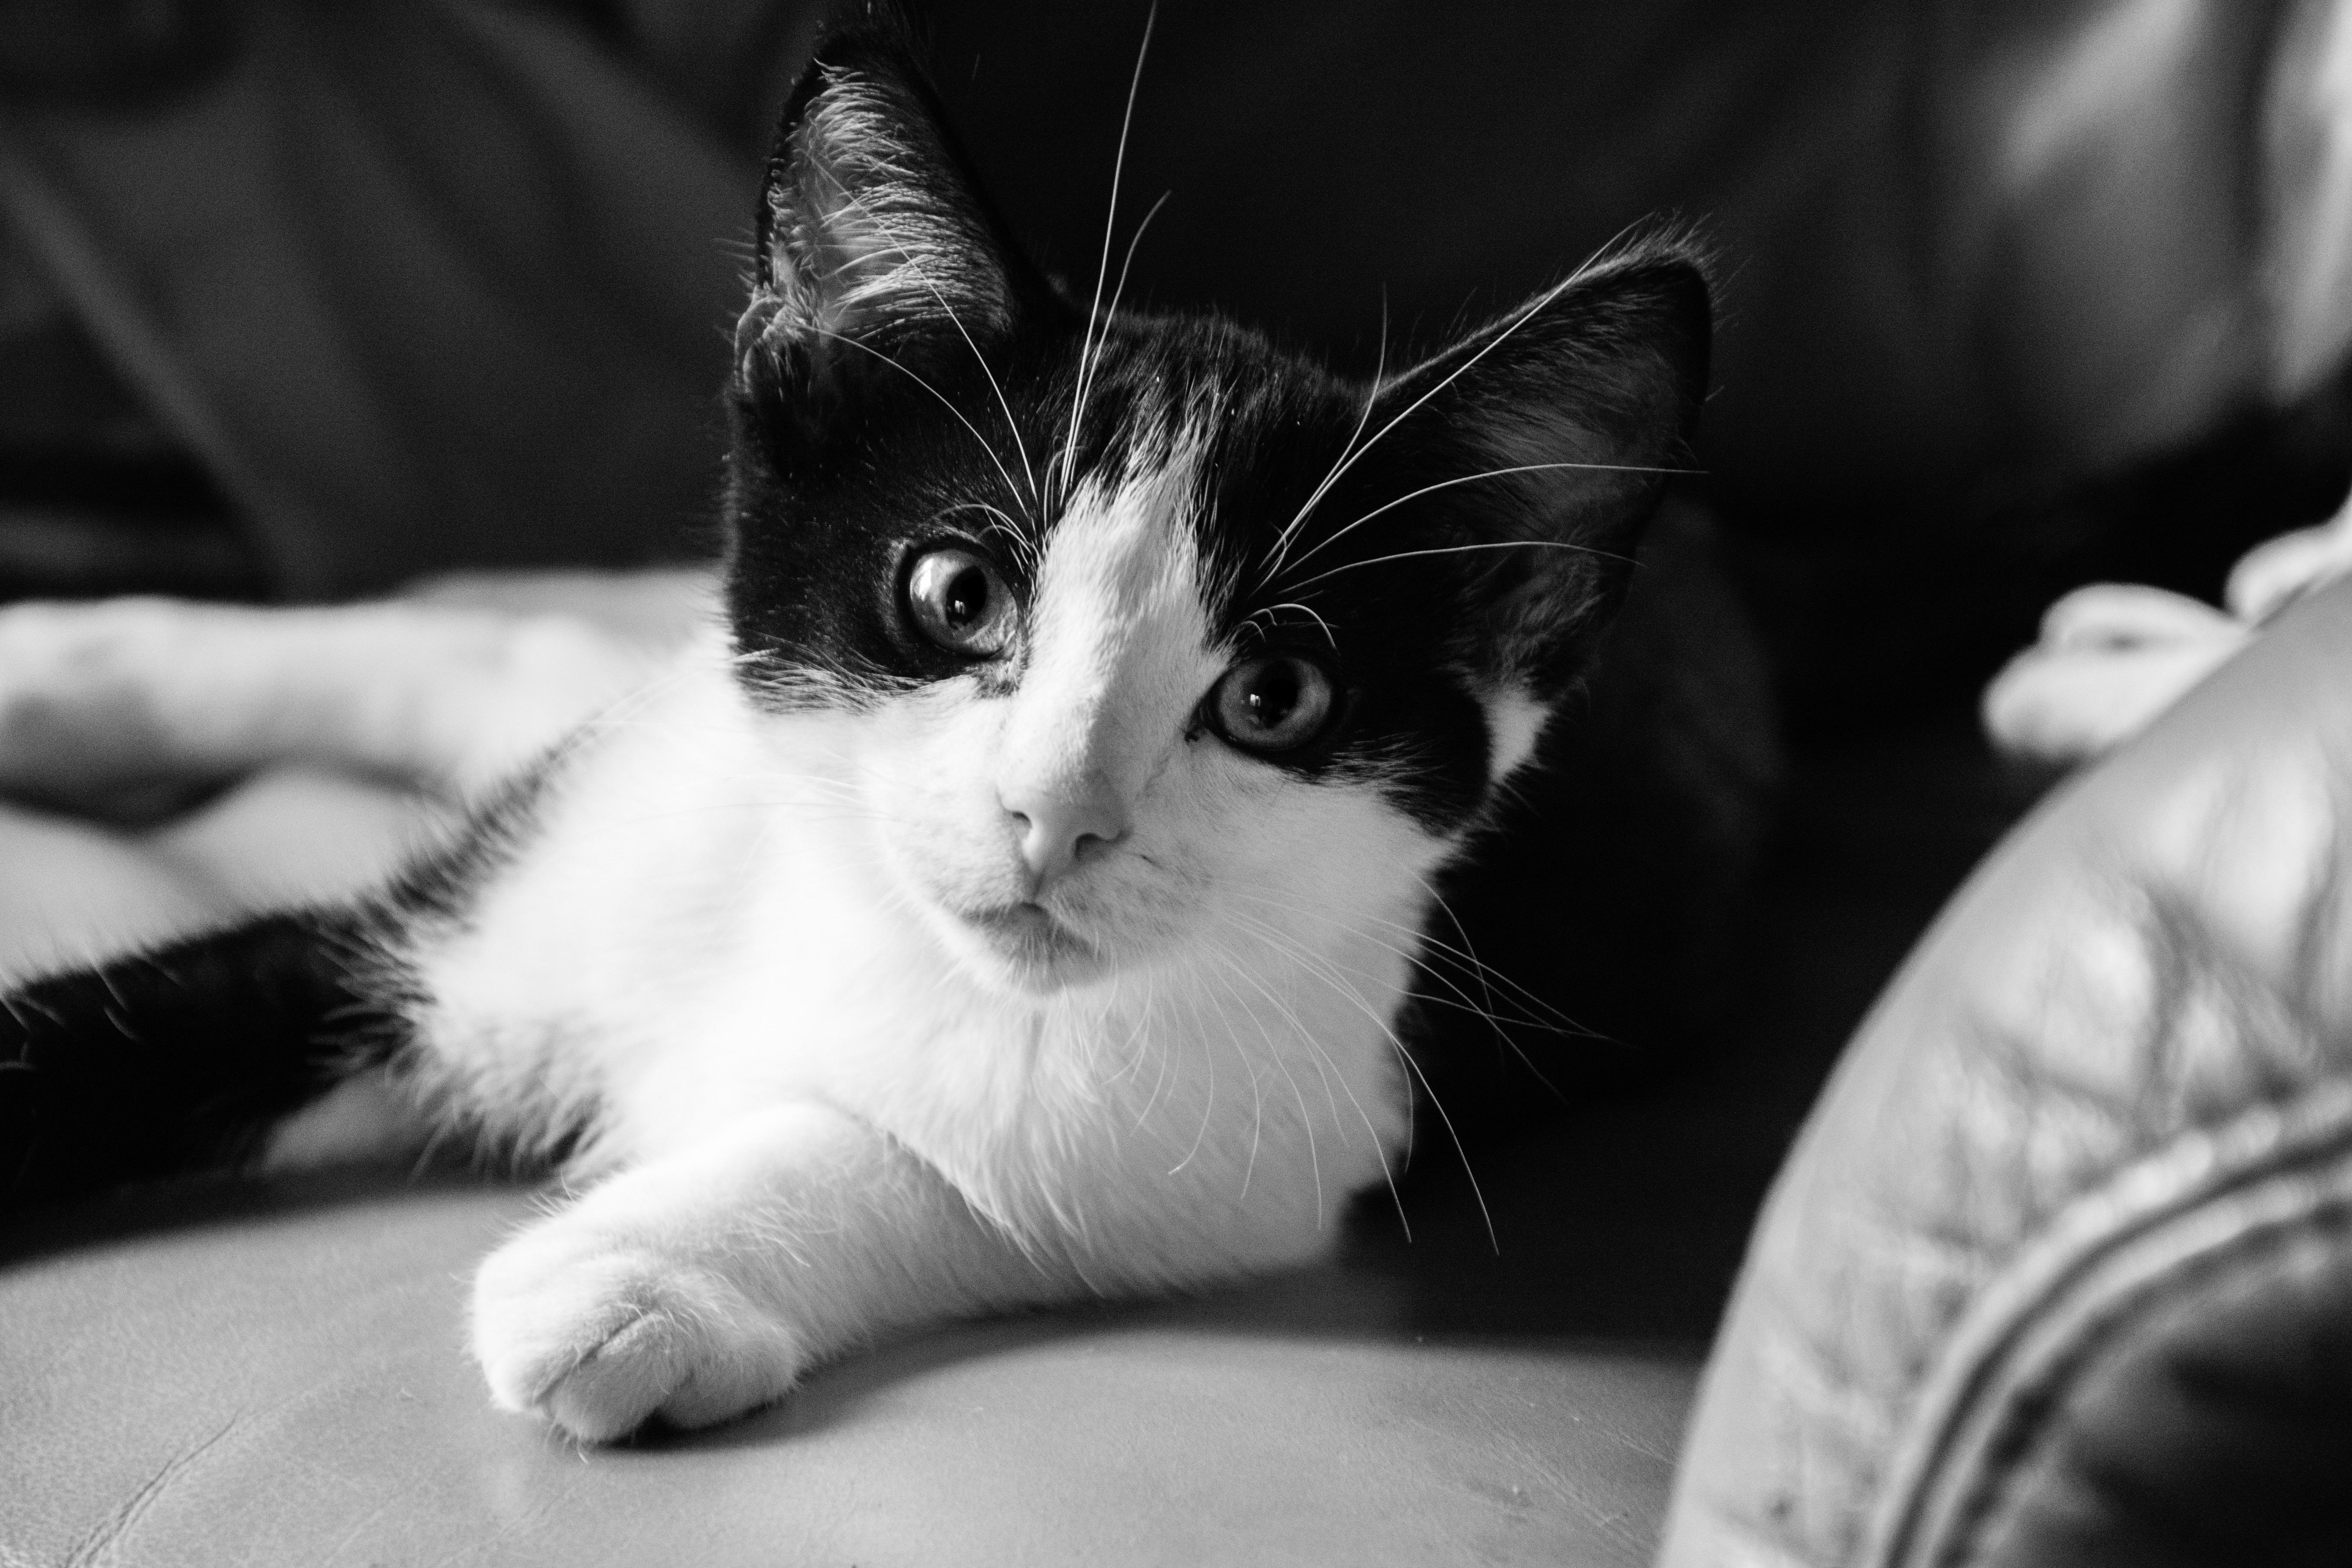 Jual Kucing Munchkin Bali Jual Kucing Persia Kitten Lucu